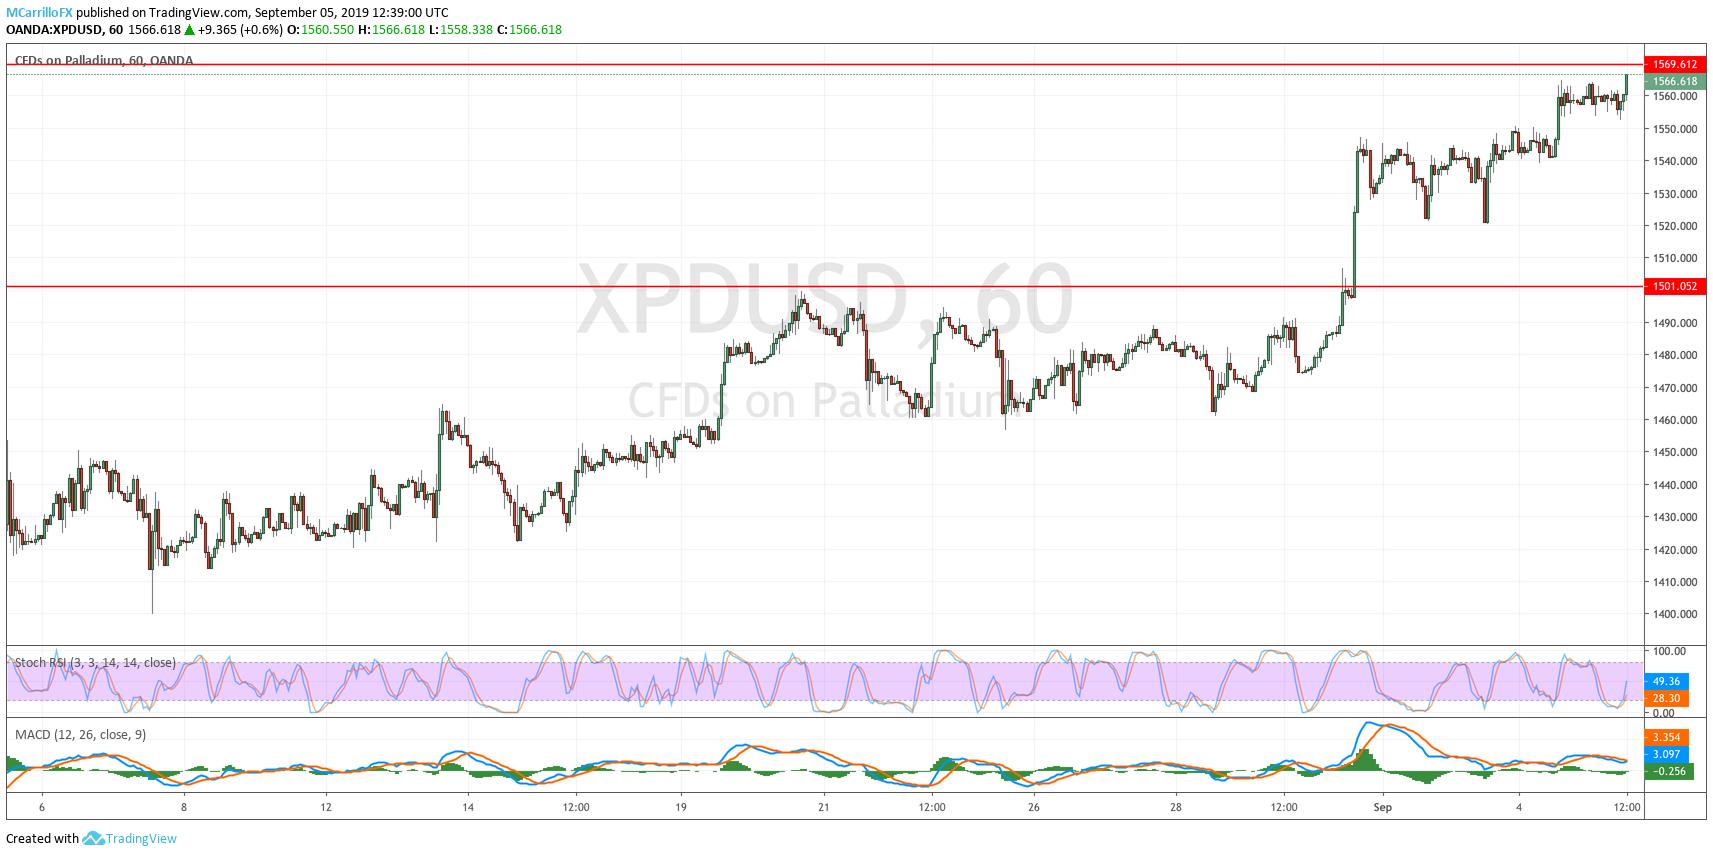 XPDUSD Palladium 1-hour chart September 5